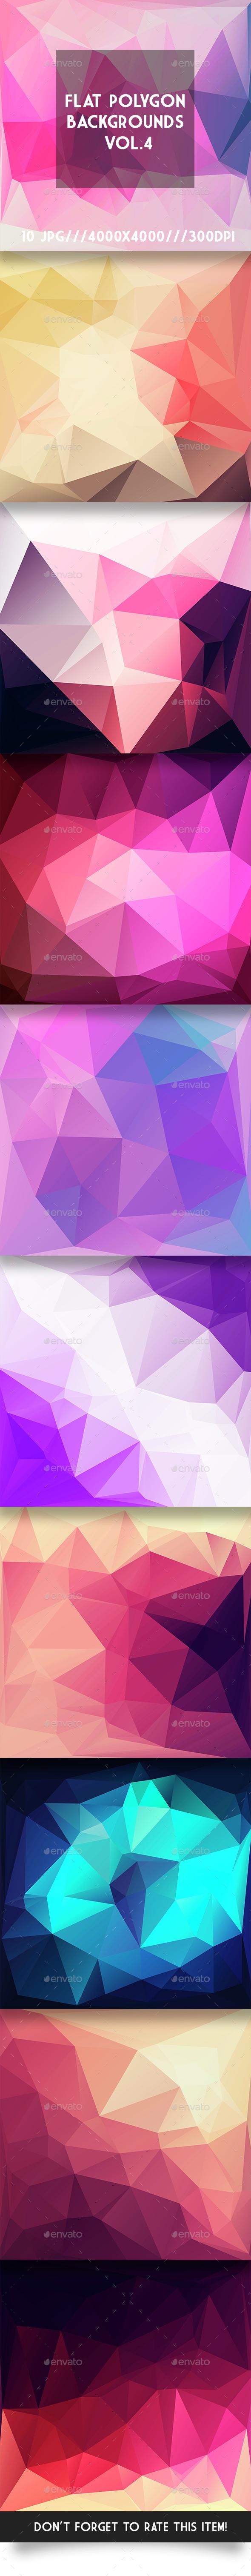 Flat Polygon Backgrounds Vol.4